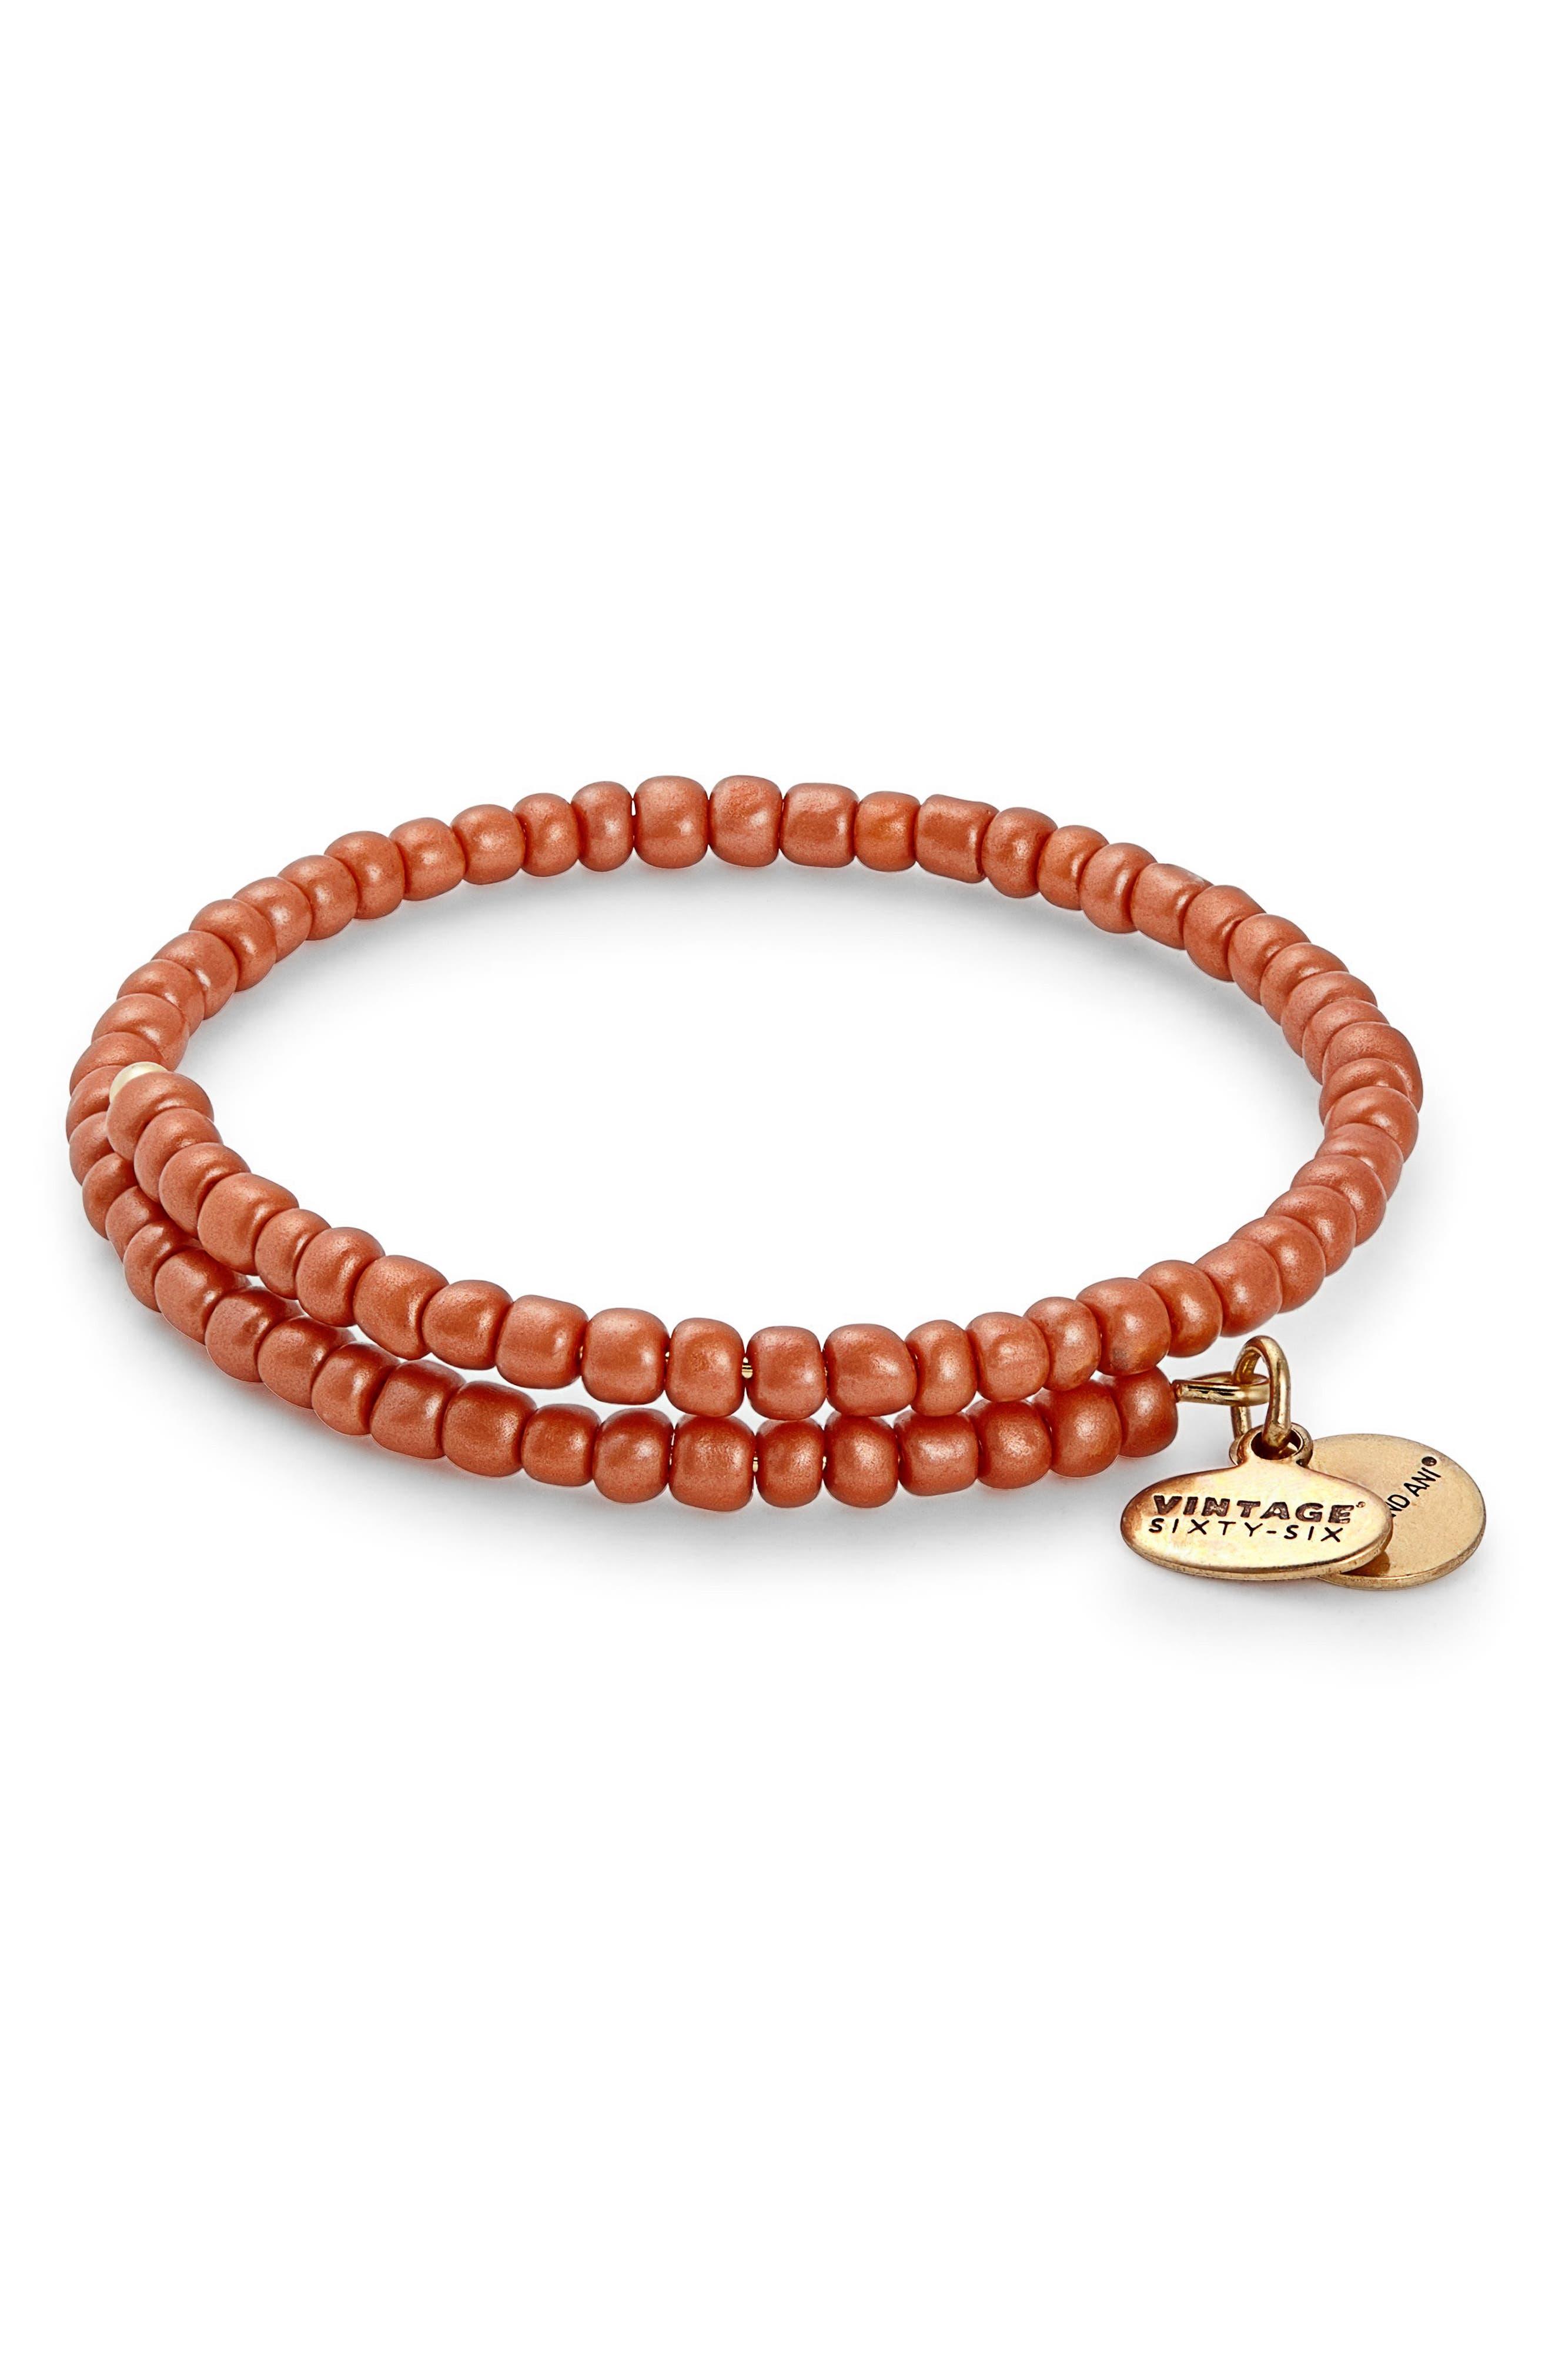 Primal Spirit Wrap Bracelet,                             Main thumbnail 1, color,                             Orange/ Gold